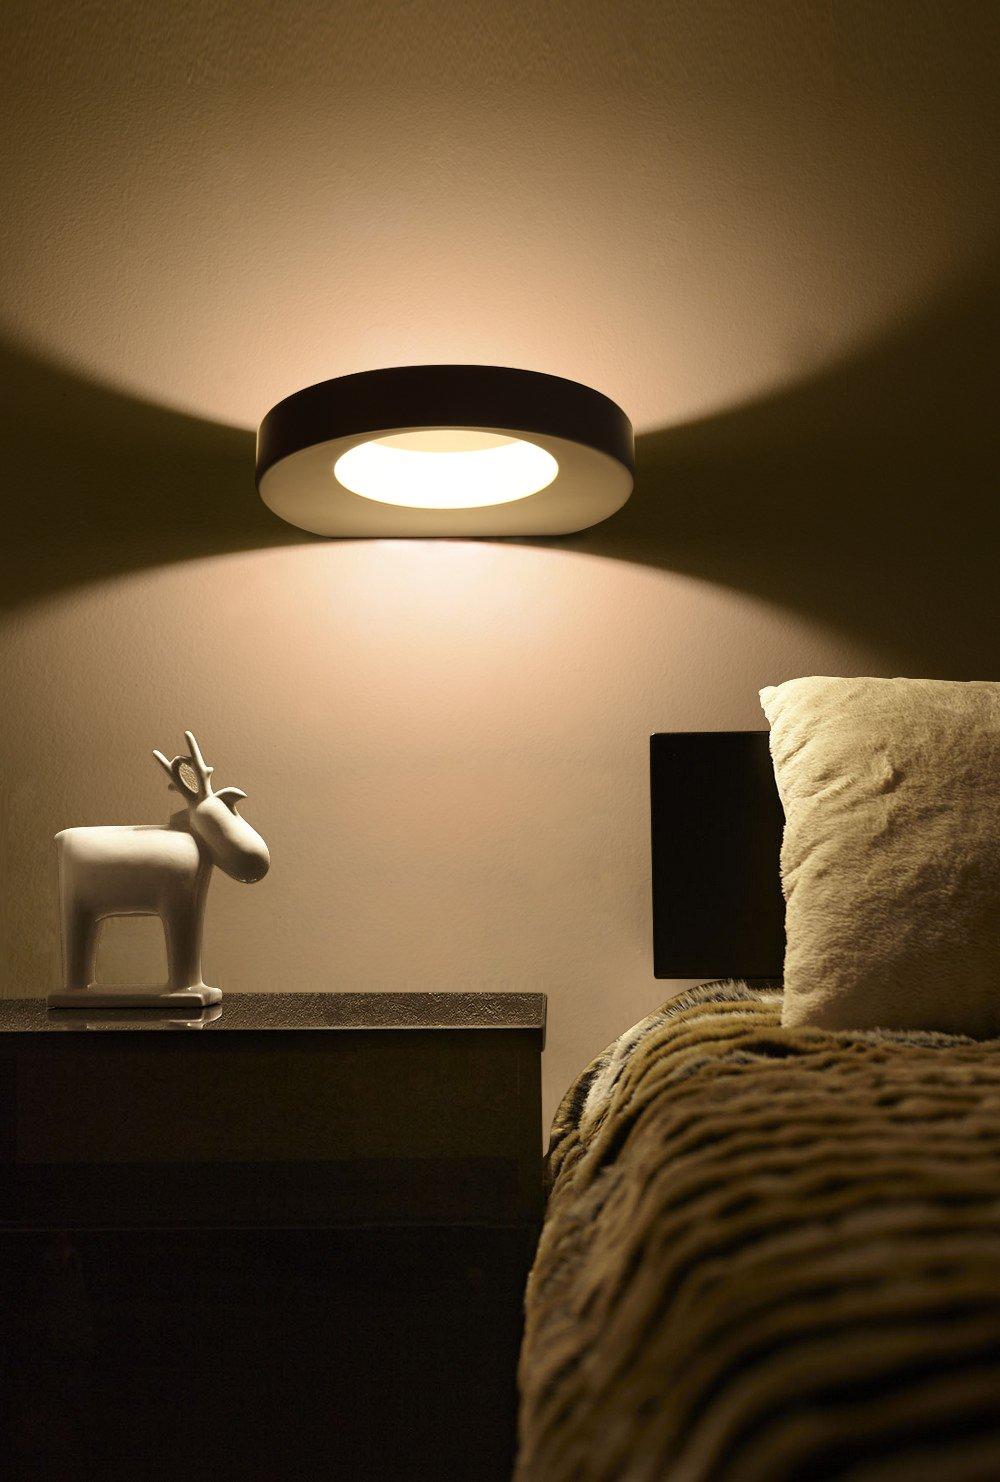 Lanfu 10 W lampada design moderno bianco caldo Lampada parete ...